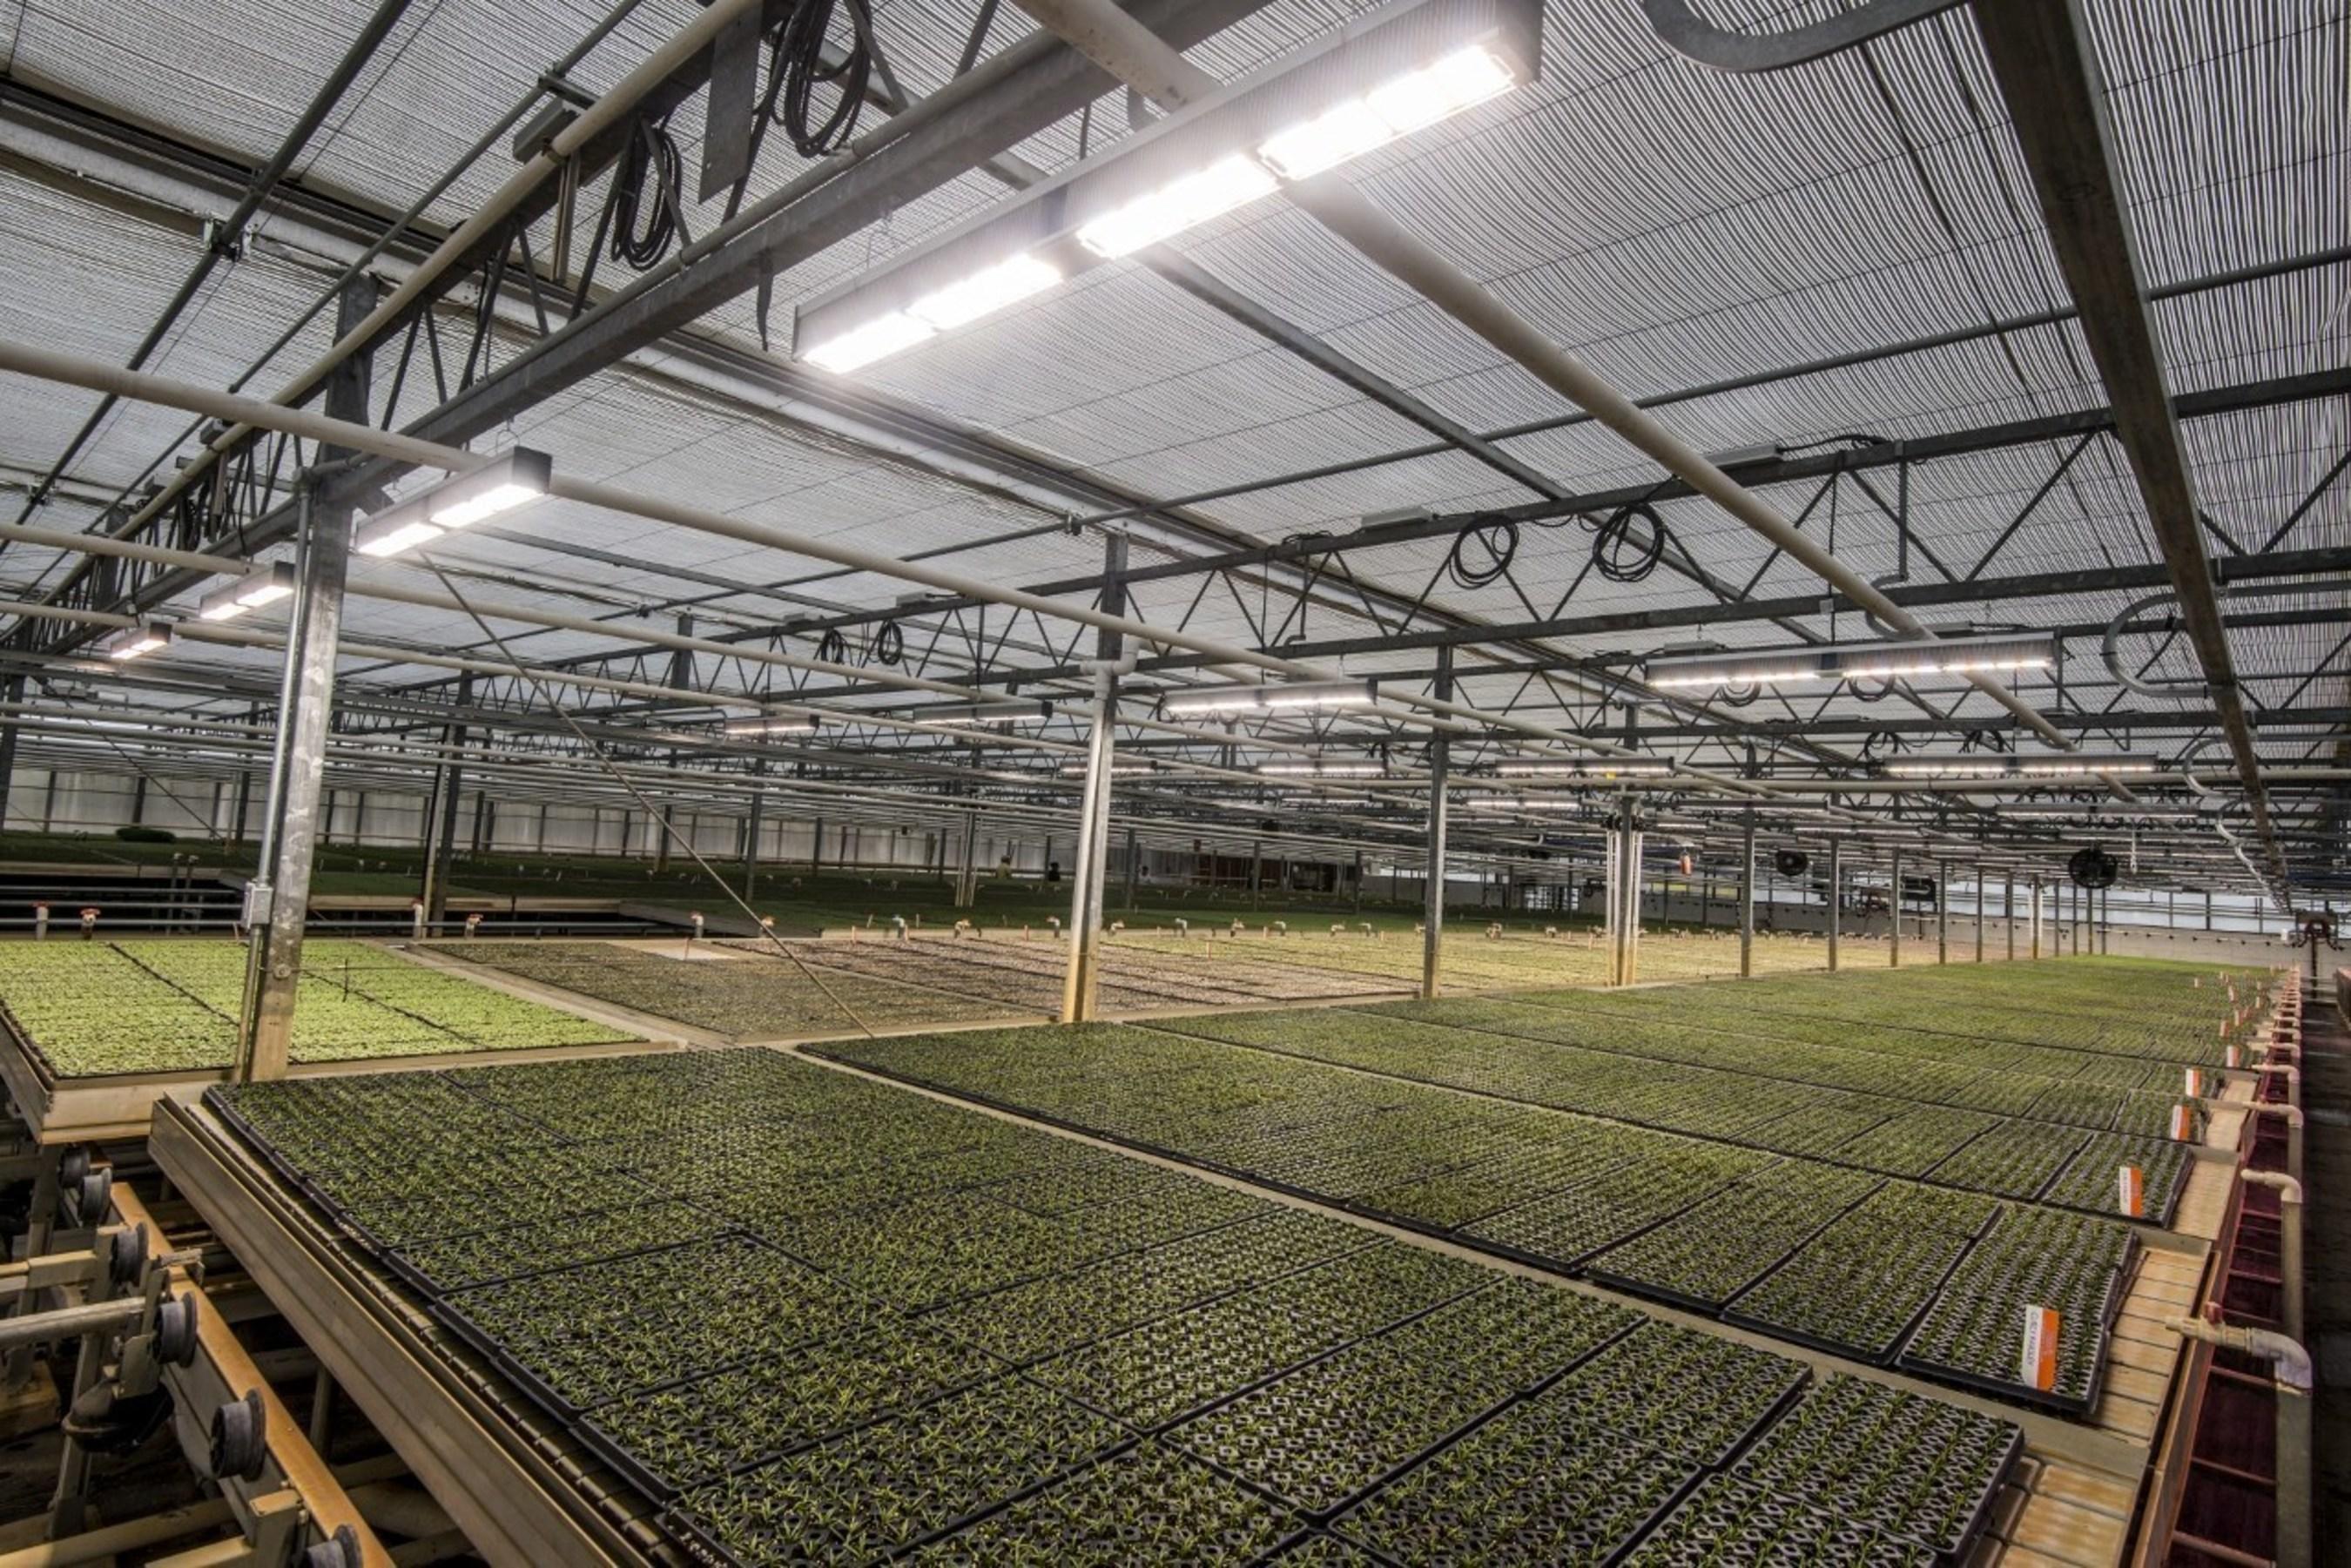 Fluence Bioengineering Achieves Breakthrough in Horticulture